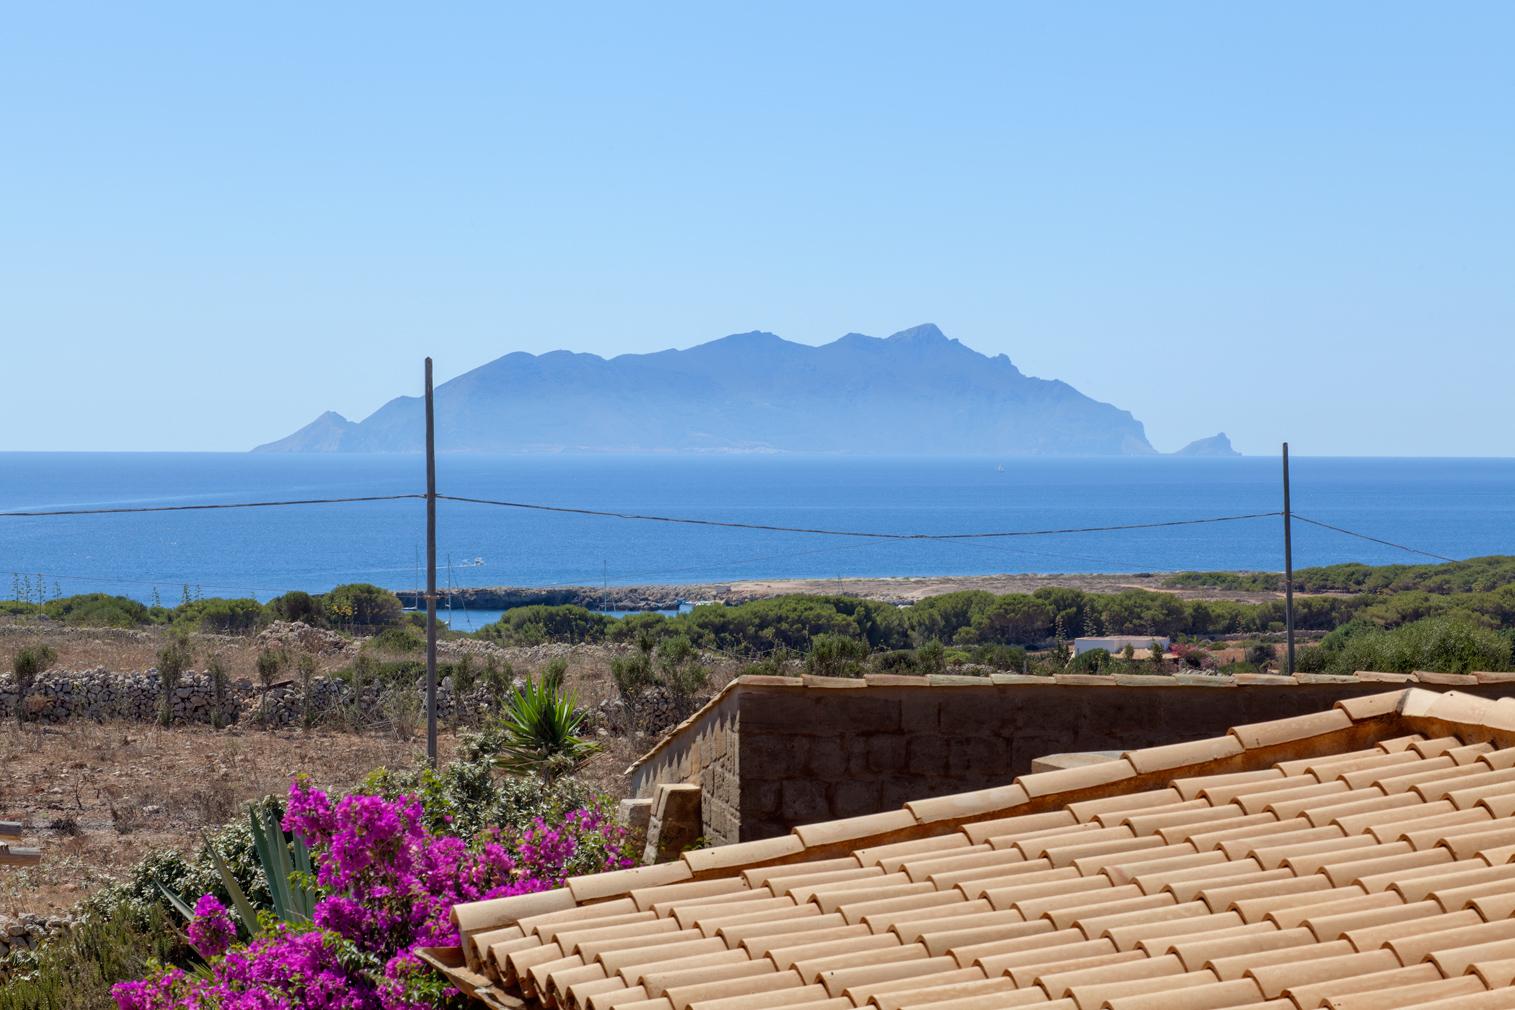 Restored masseria on Favignana island lists for €1.6m